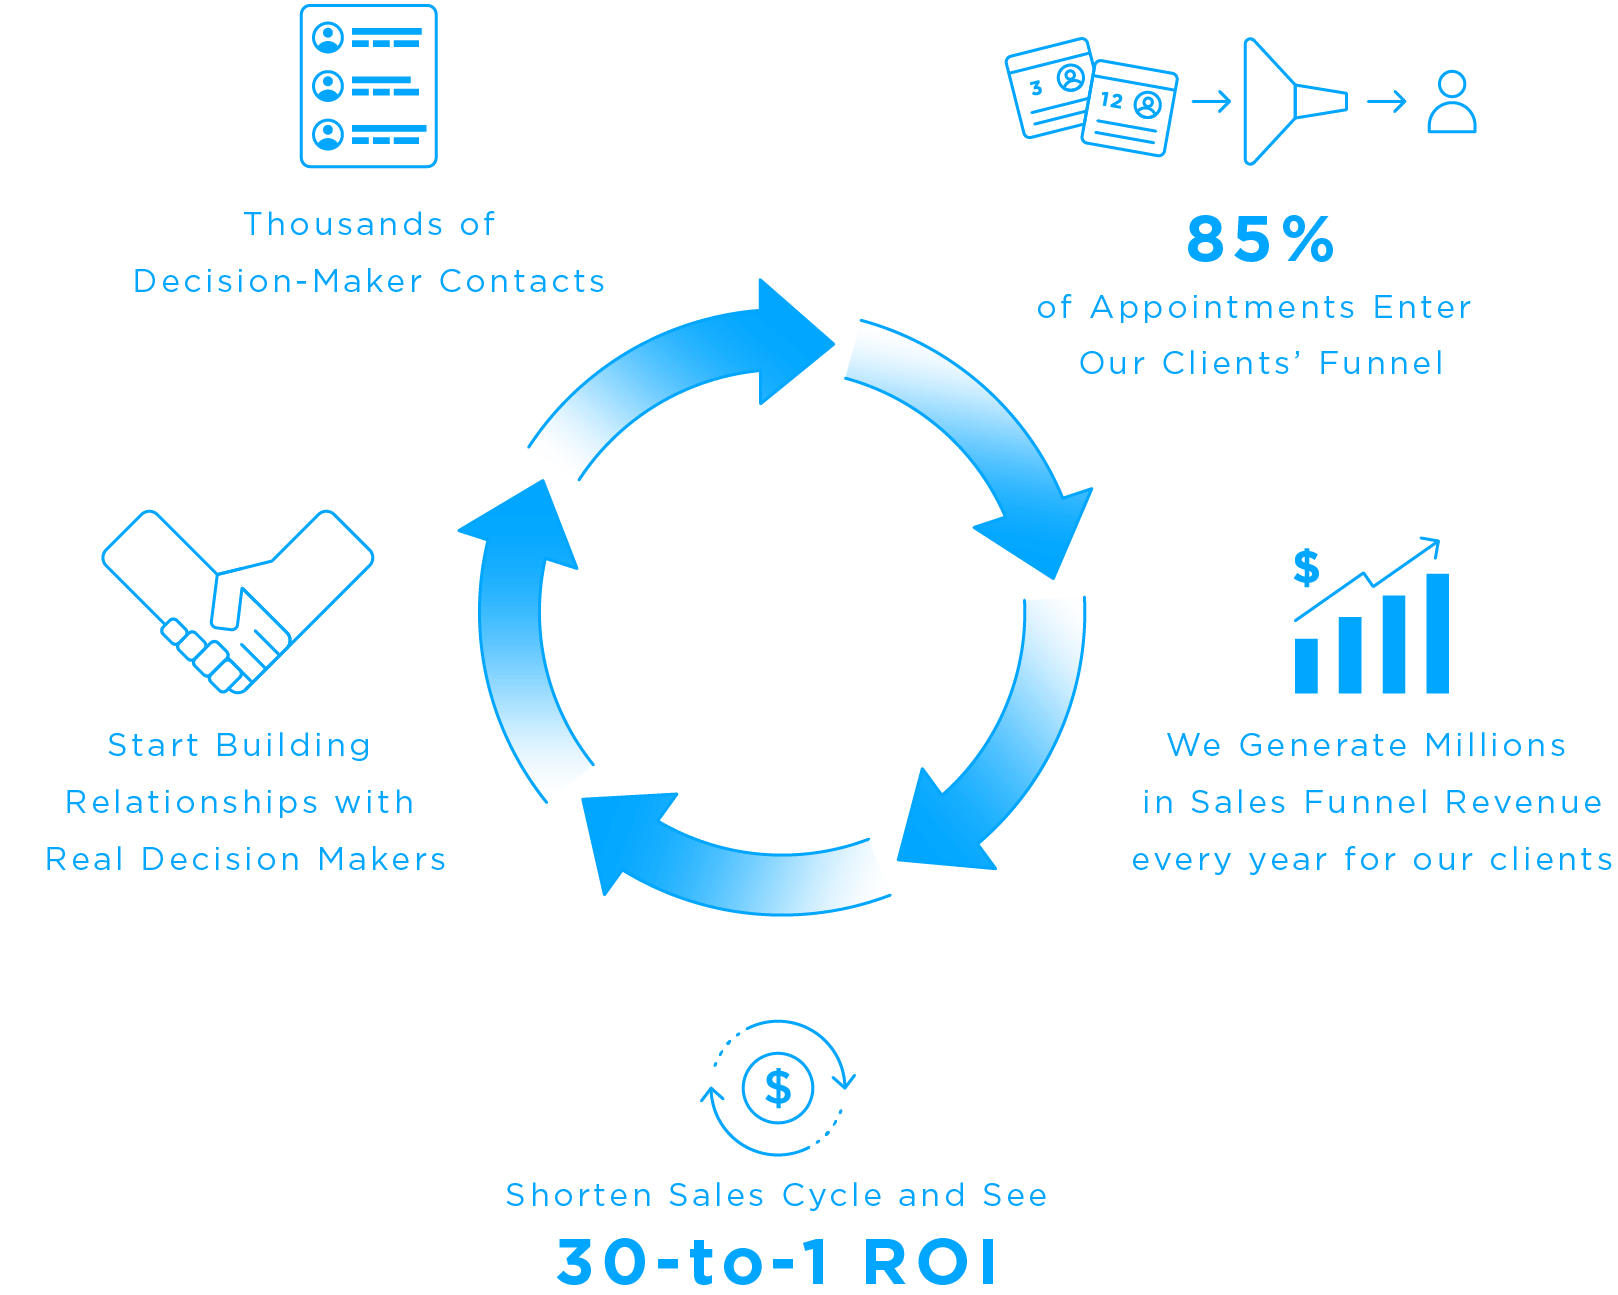 C-Level Homepage Infographic